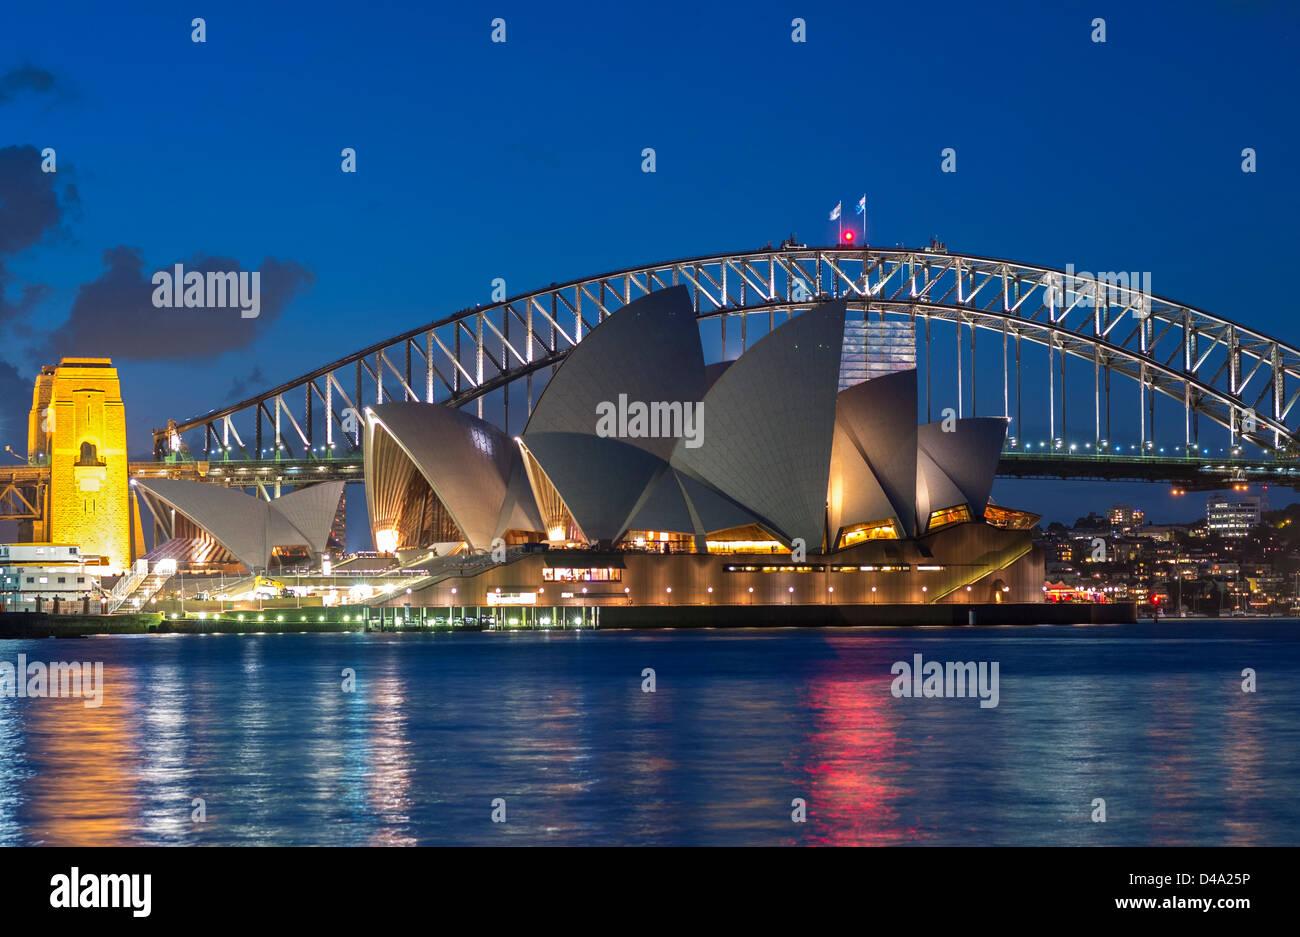 Sydney opera house and harbour bridge - Stock Photo View Sydney Opera House And Harbour Bridge At Night In Australia